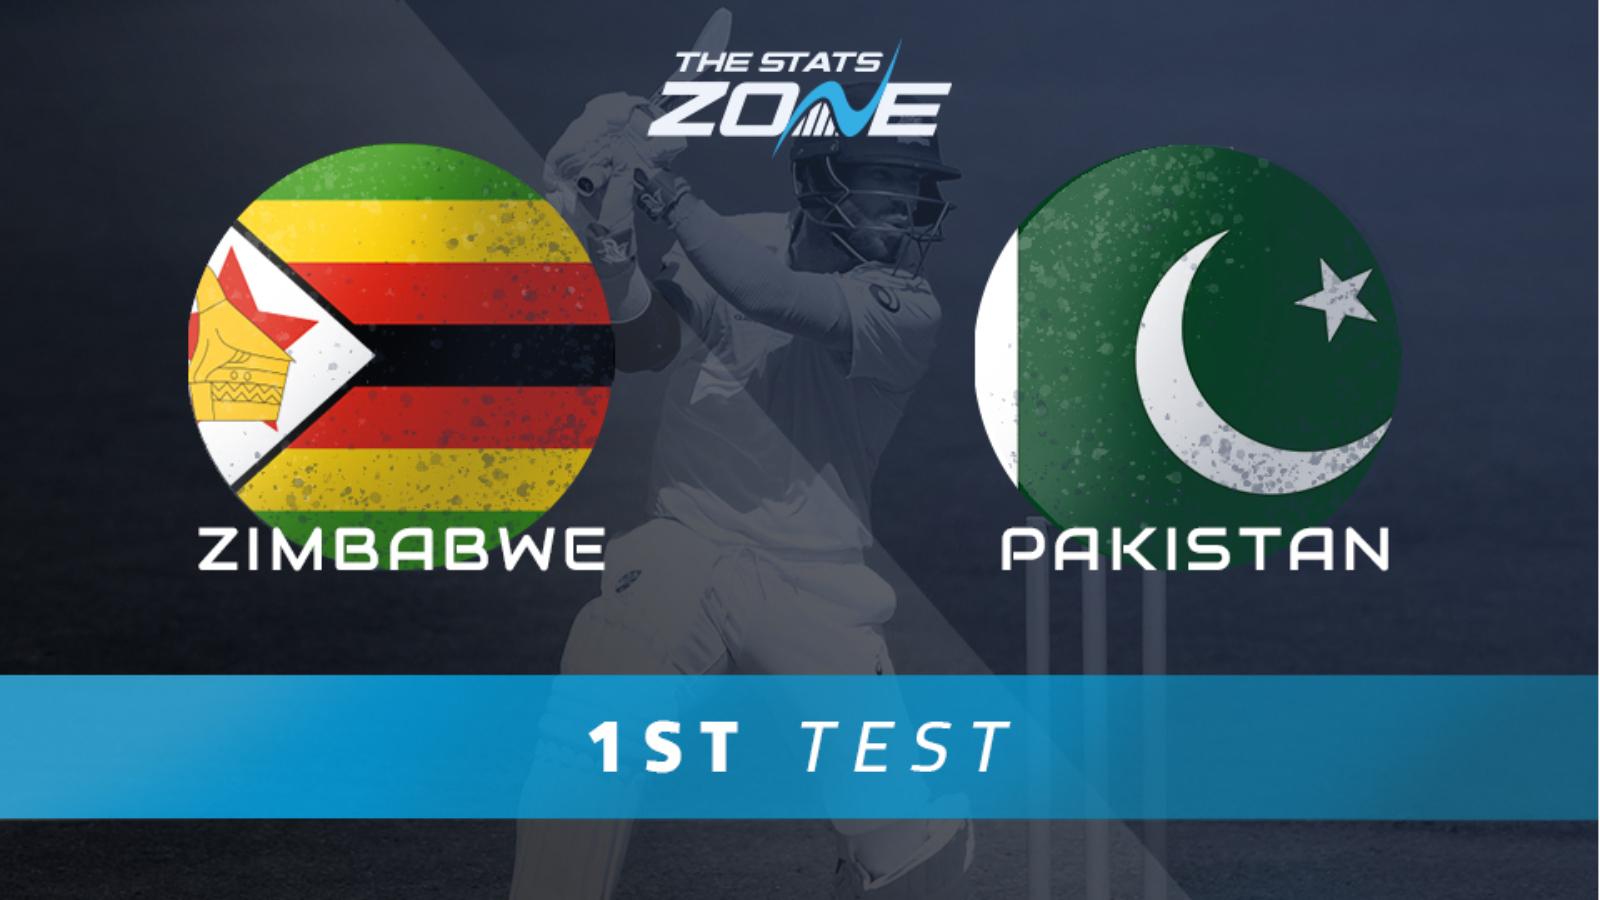 Zimbabwe vs Pakistan – 1st Test Preview & Prediction - The Stats Zone